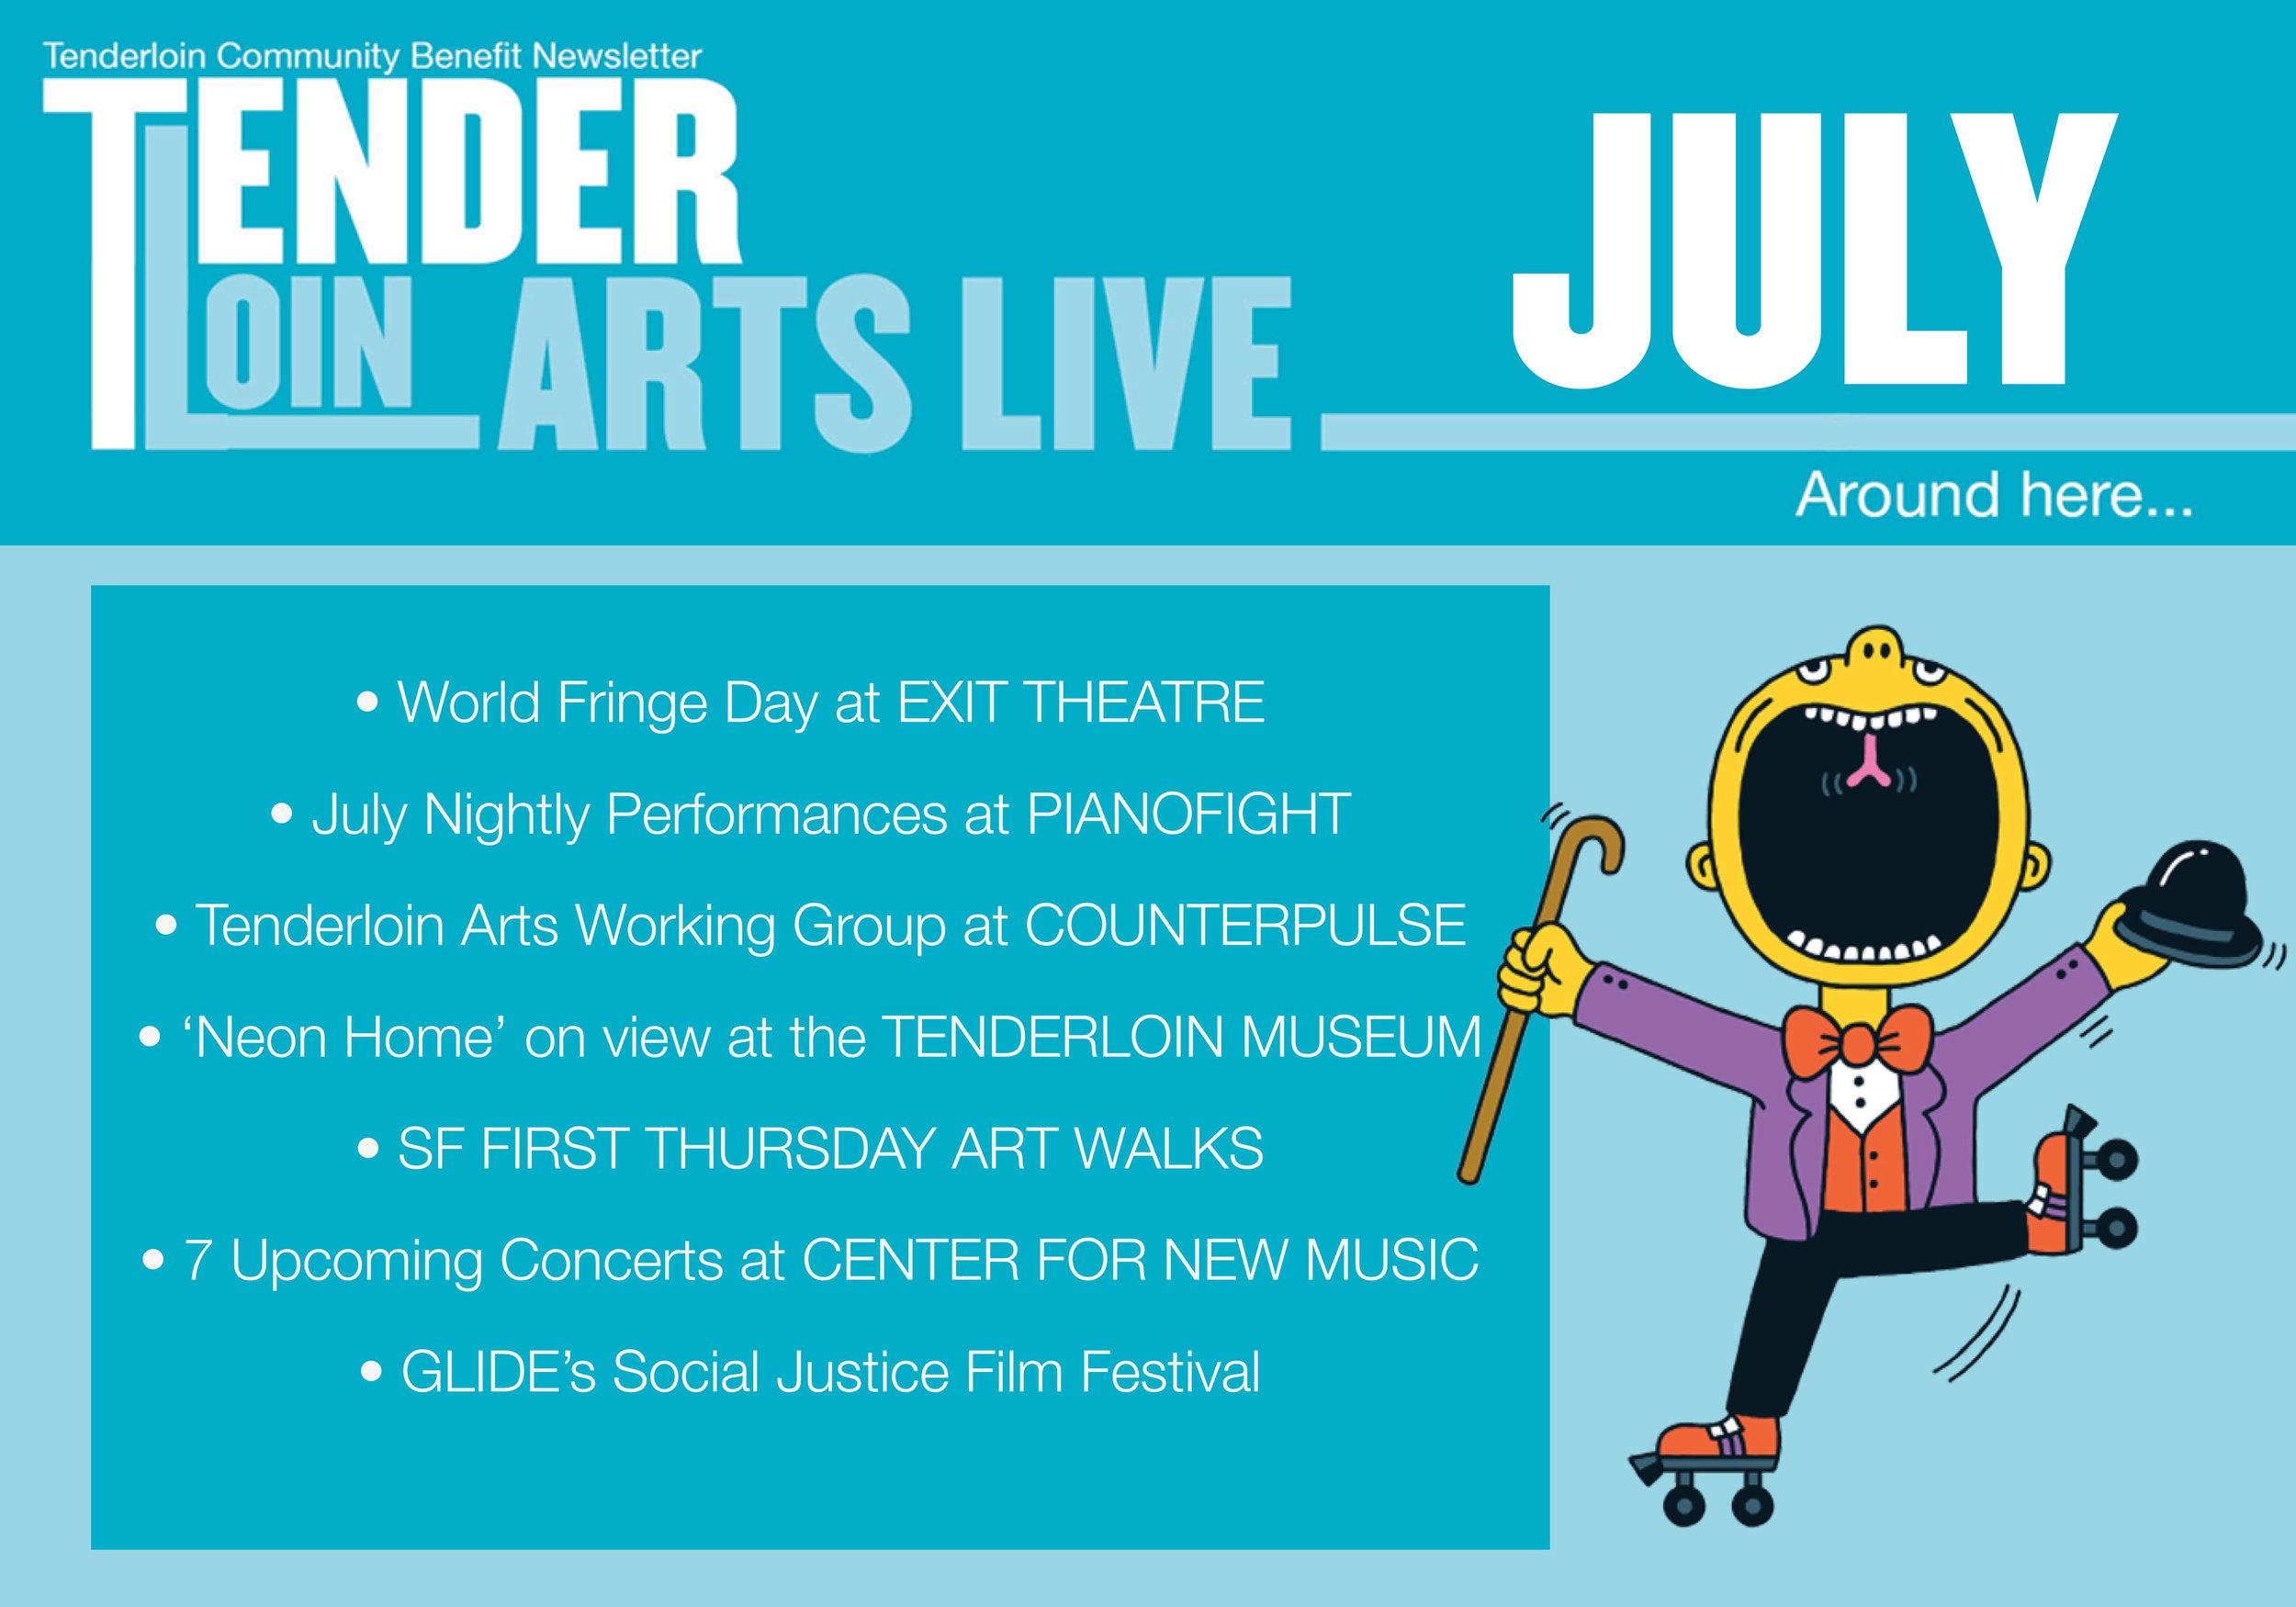 TL-Arts-Live_July.jpg